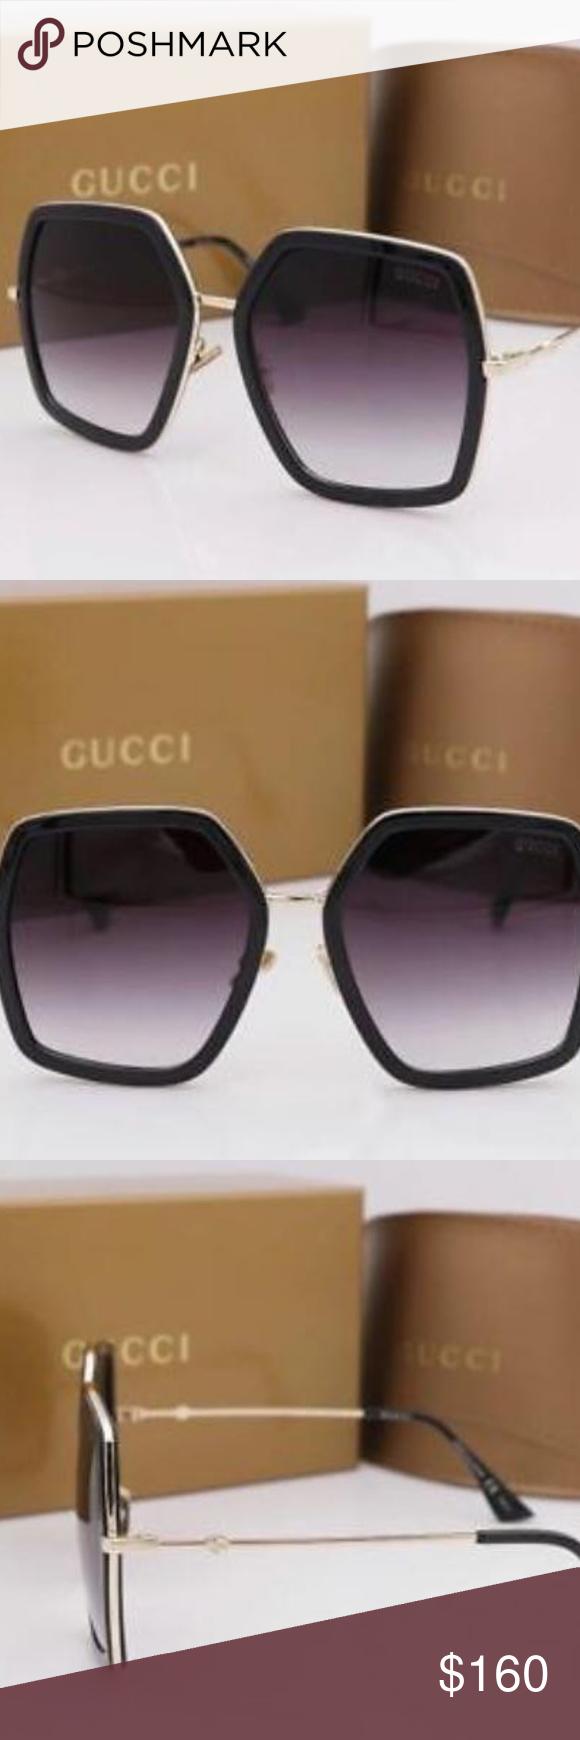 8b28dd3b01c Brand New Gucci Sunglasses GG 0106 S Black Gold Gr Gucci